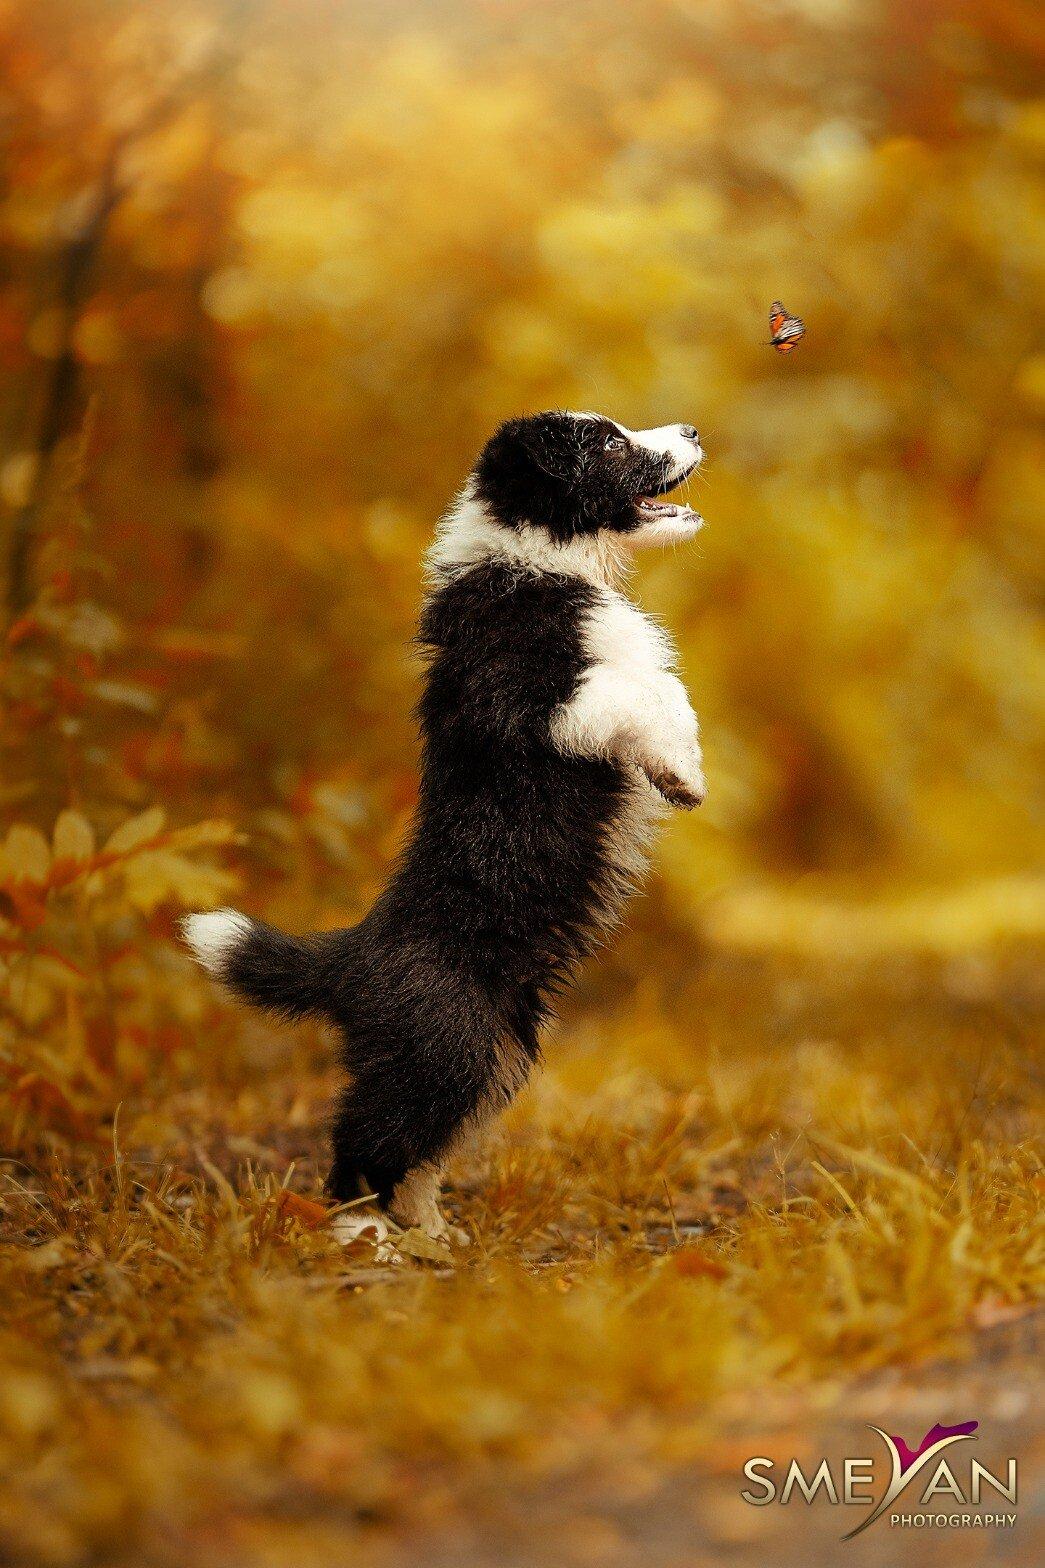 pup butterfly.jpeg